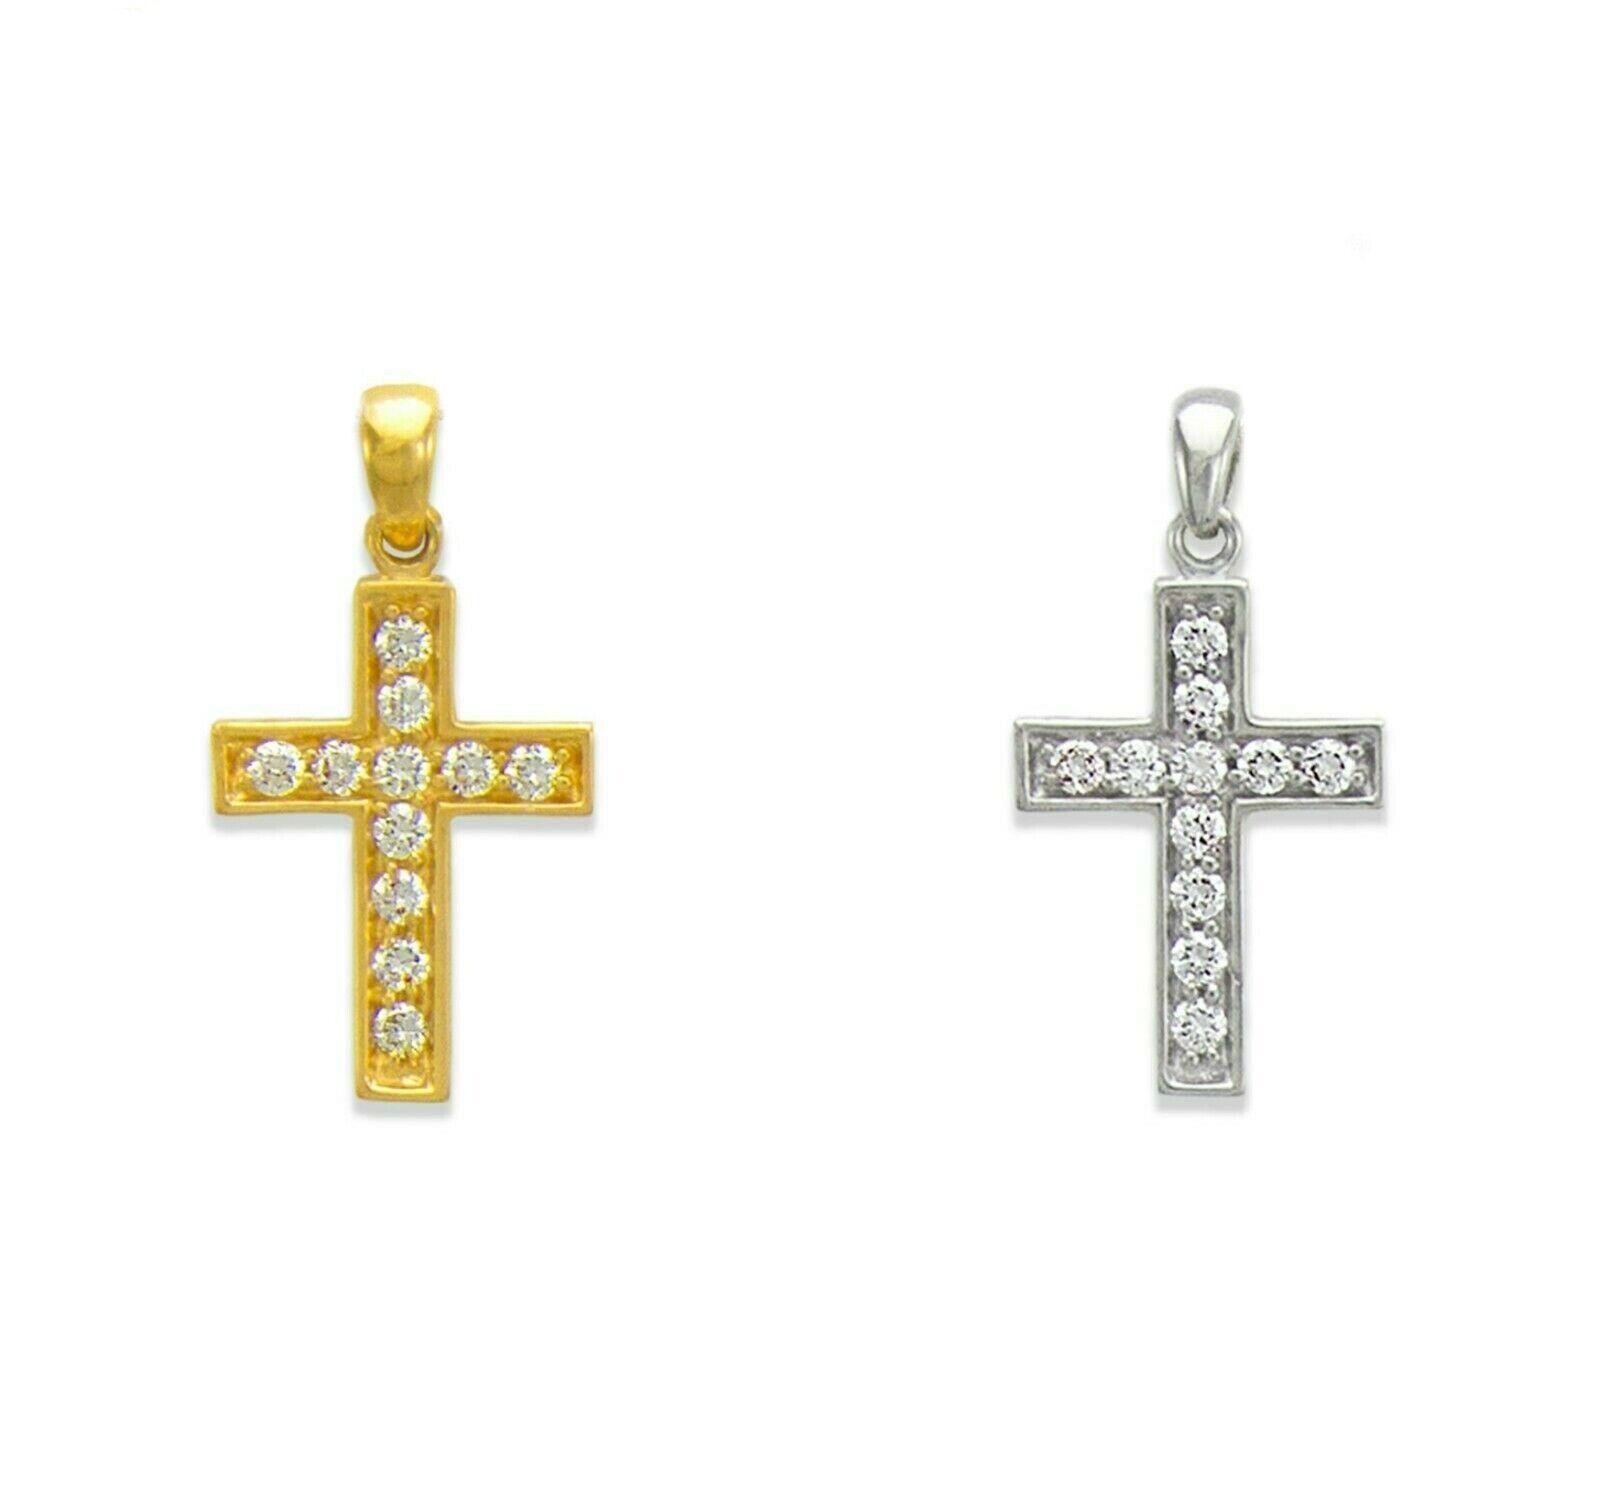 Gold 14K CZ Necklace Religious Necklace Minimalist Necklace Dainty Necklace Diamond Cross Necklace Delicate Gold Cross Necklace Gift for Her